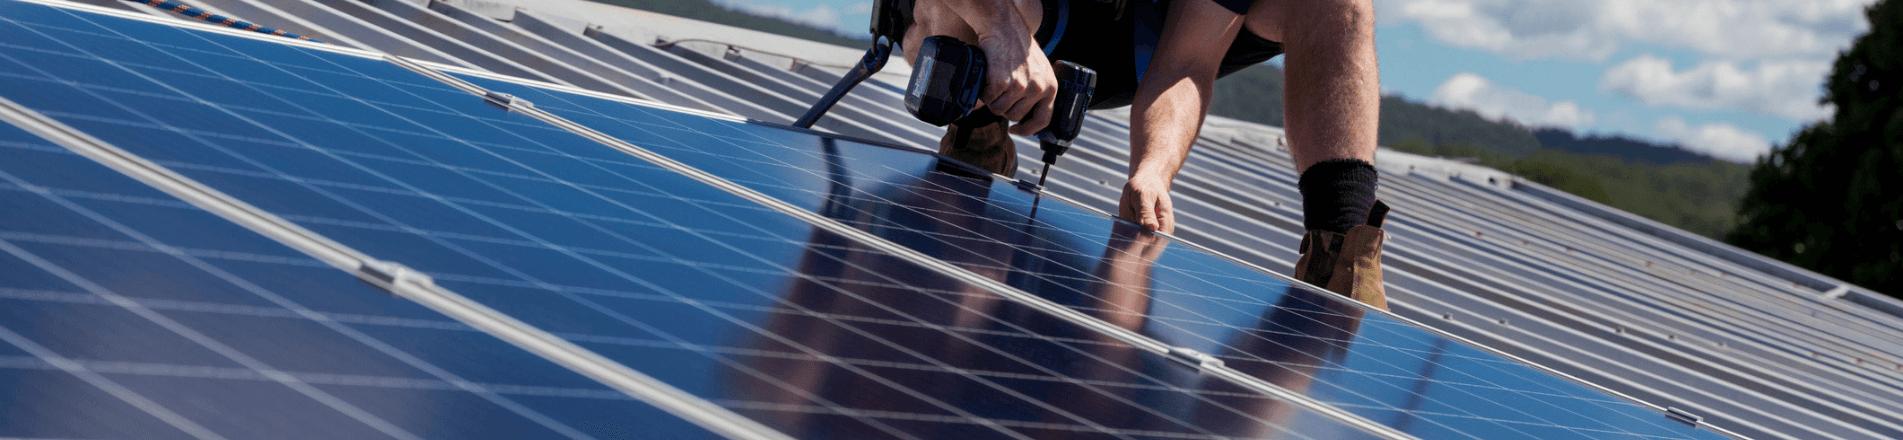 How To Install Solar Panels Evergreen Energy Wiring A Loft Light